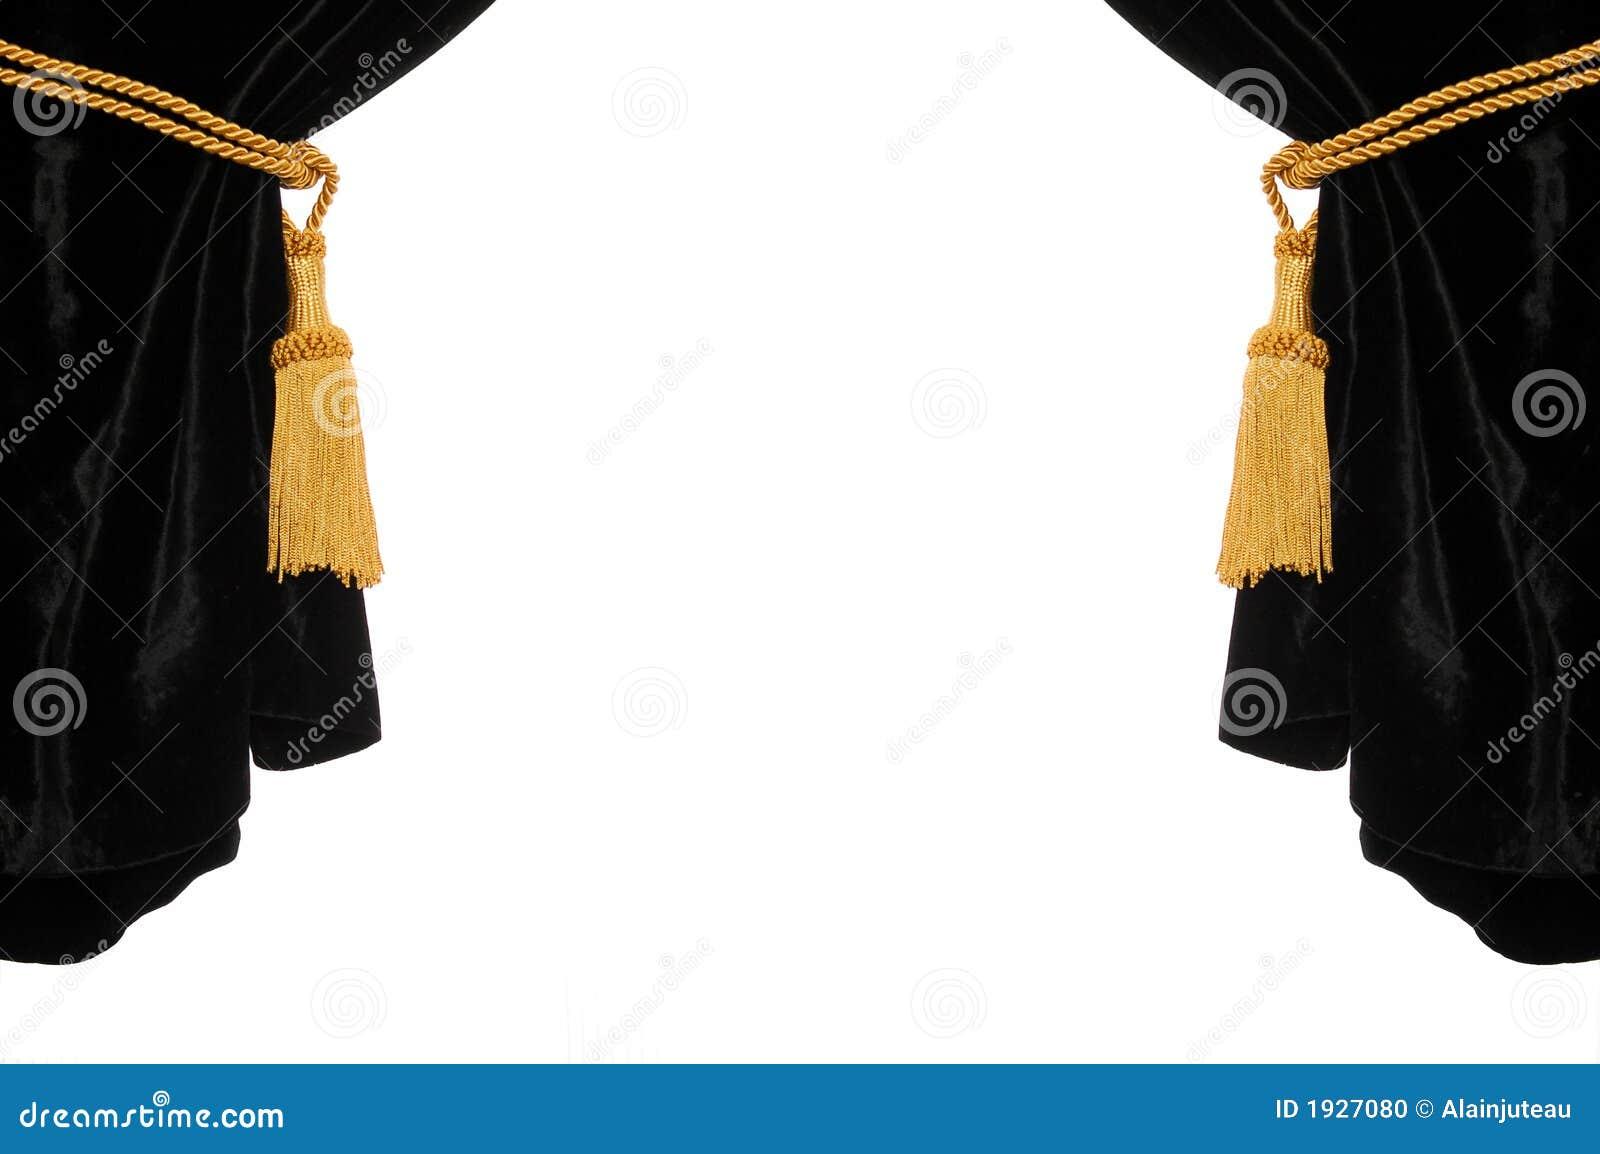 Rideau noir en velours